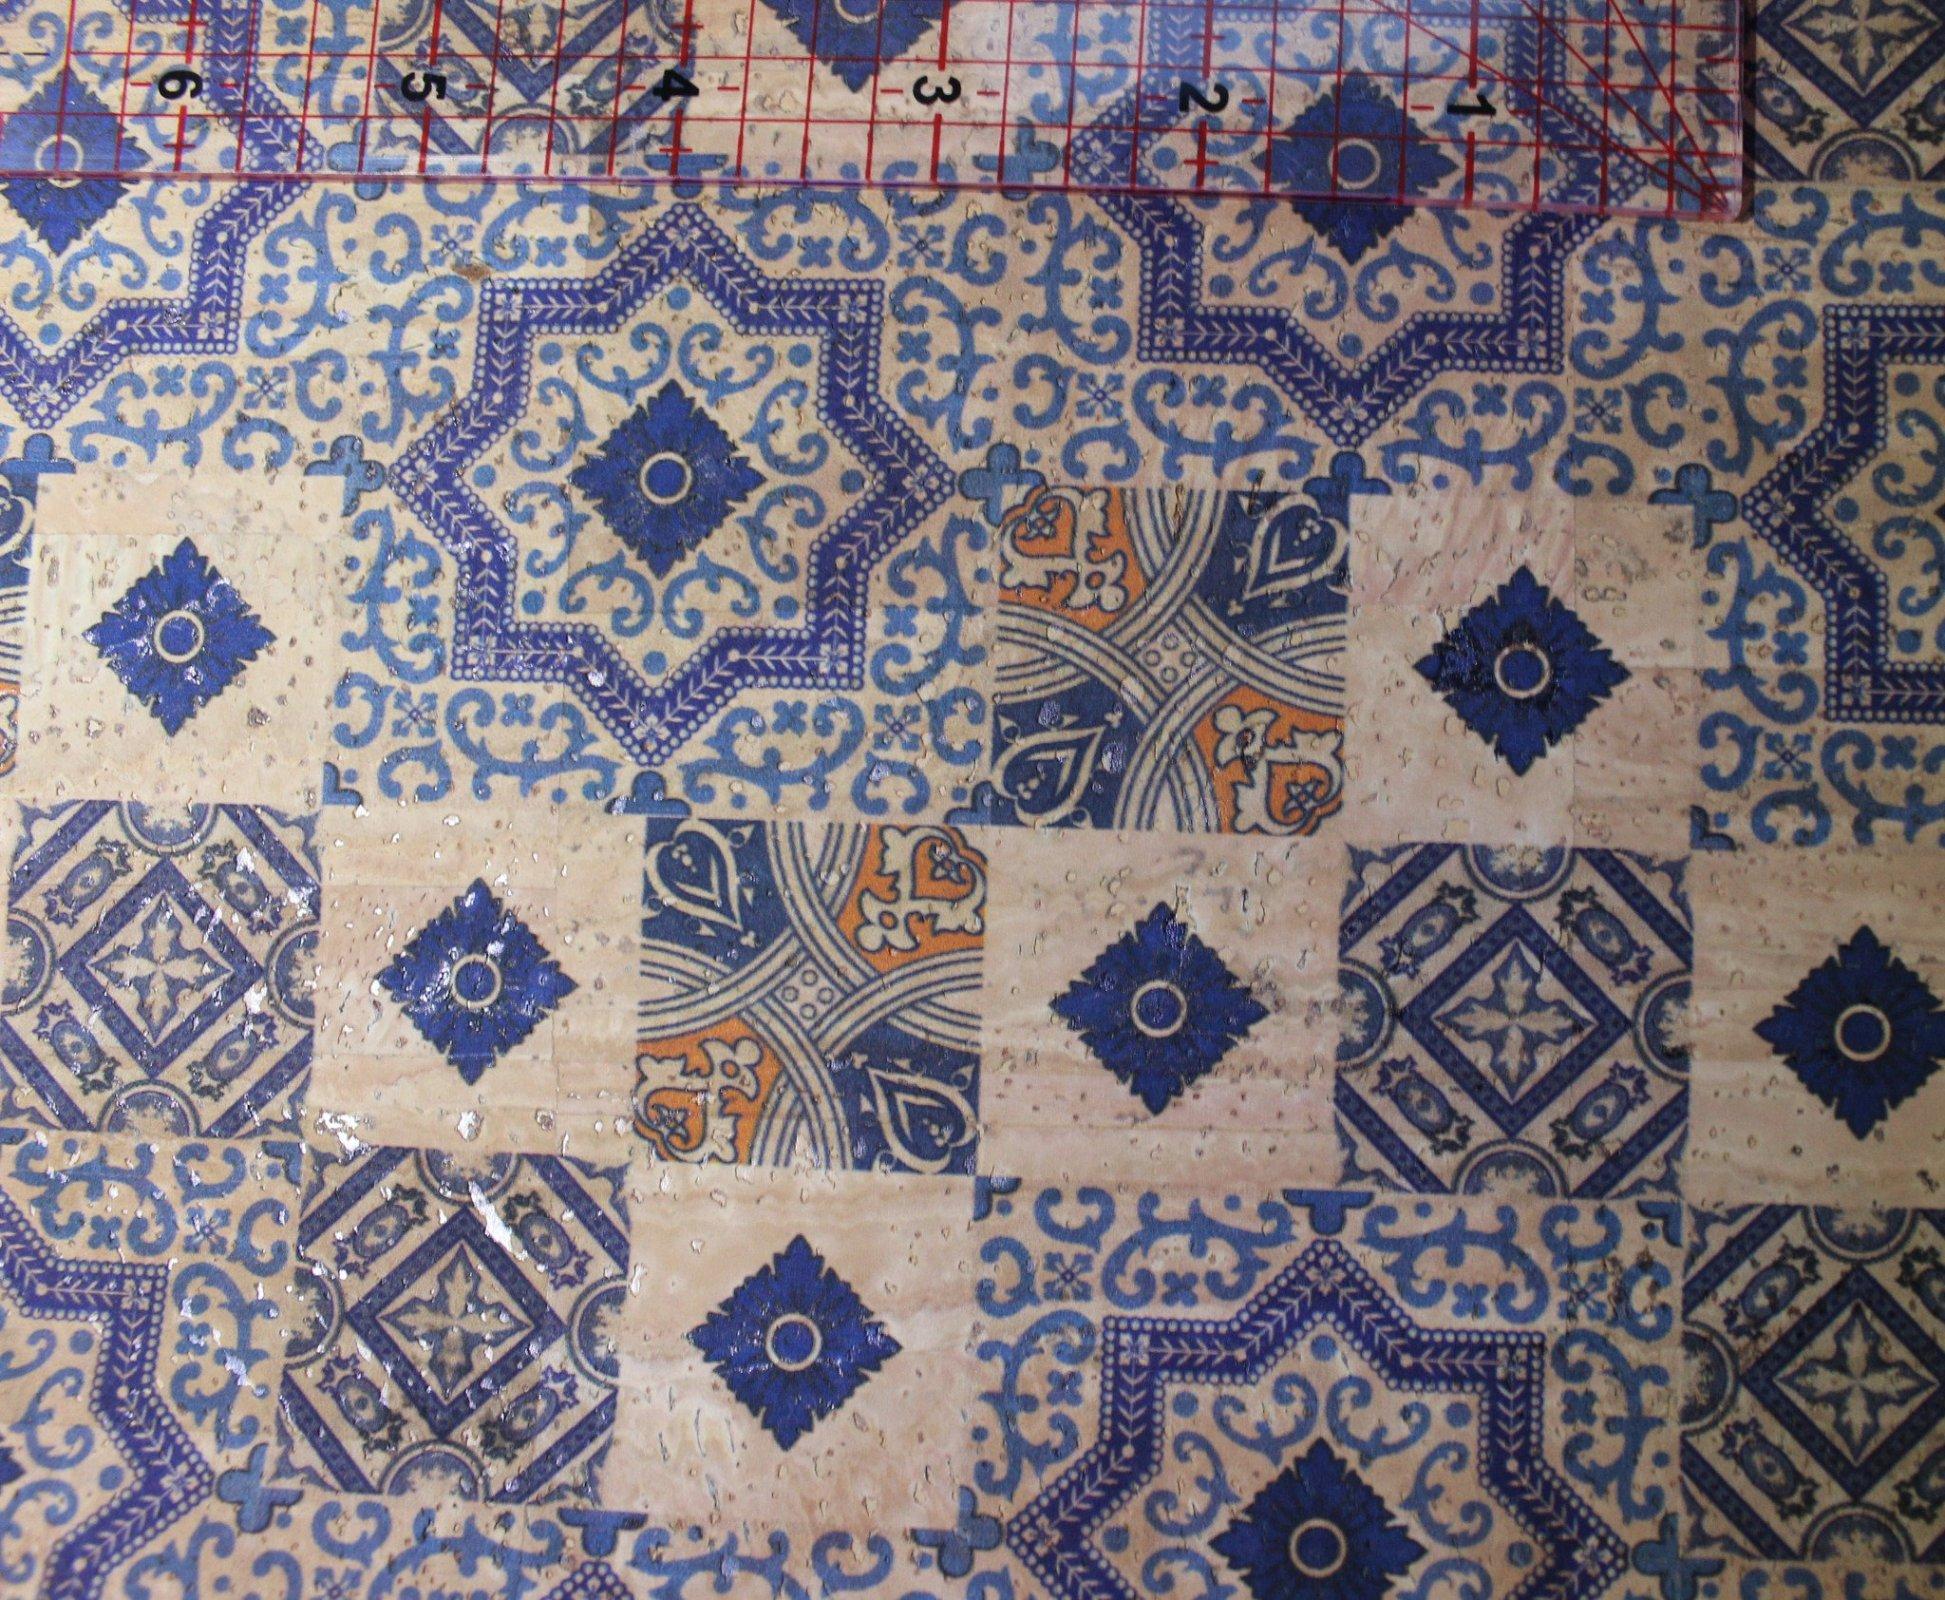 Printed Tiles Cork Fabric (36x36)